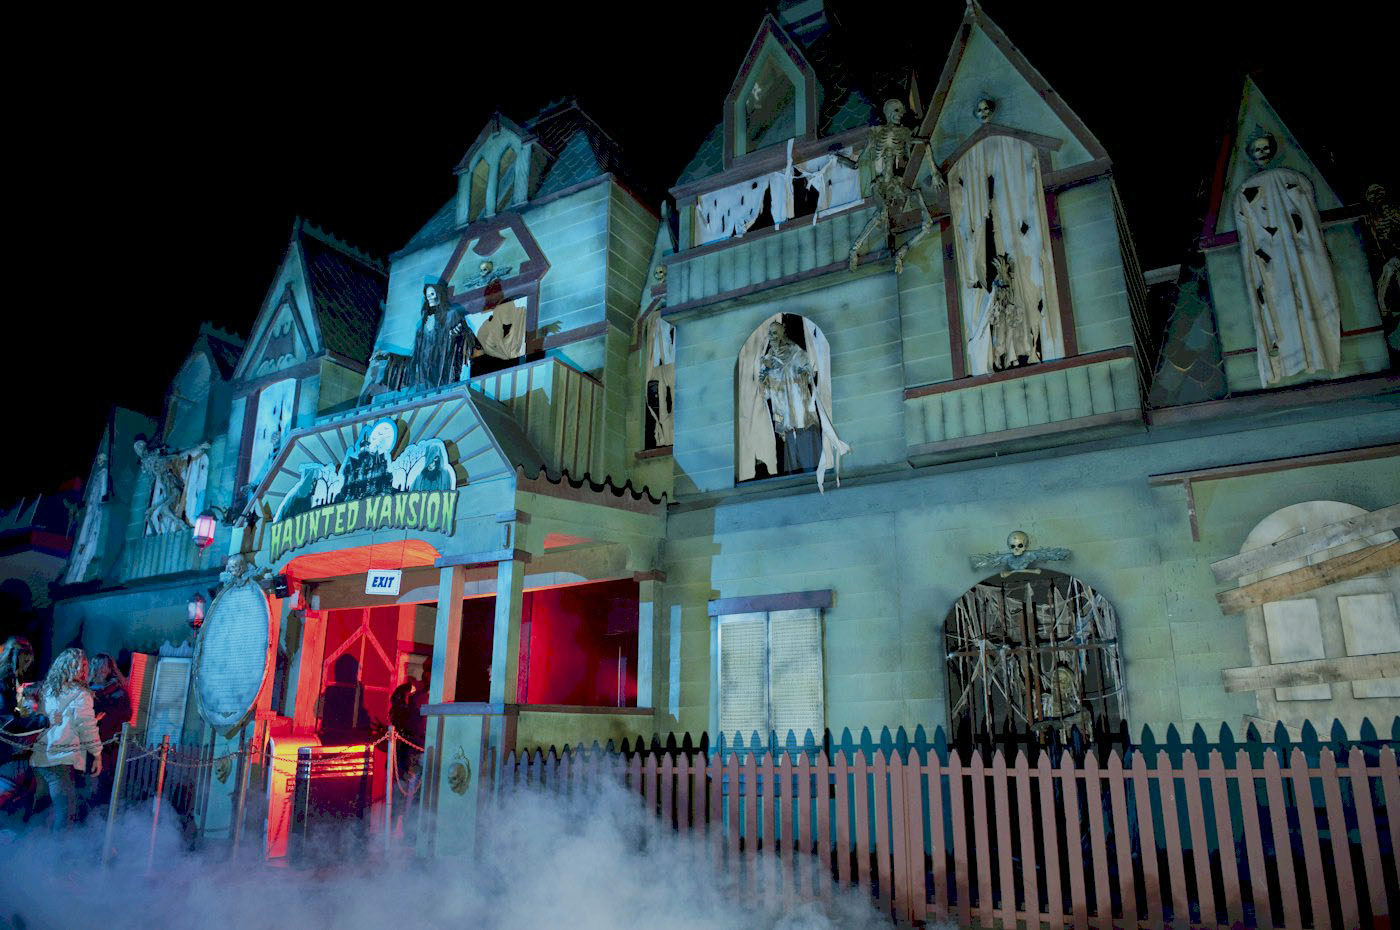 PNE playland haunted mansion